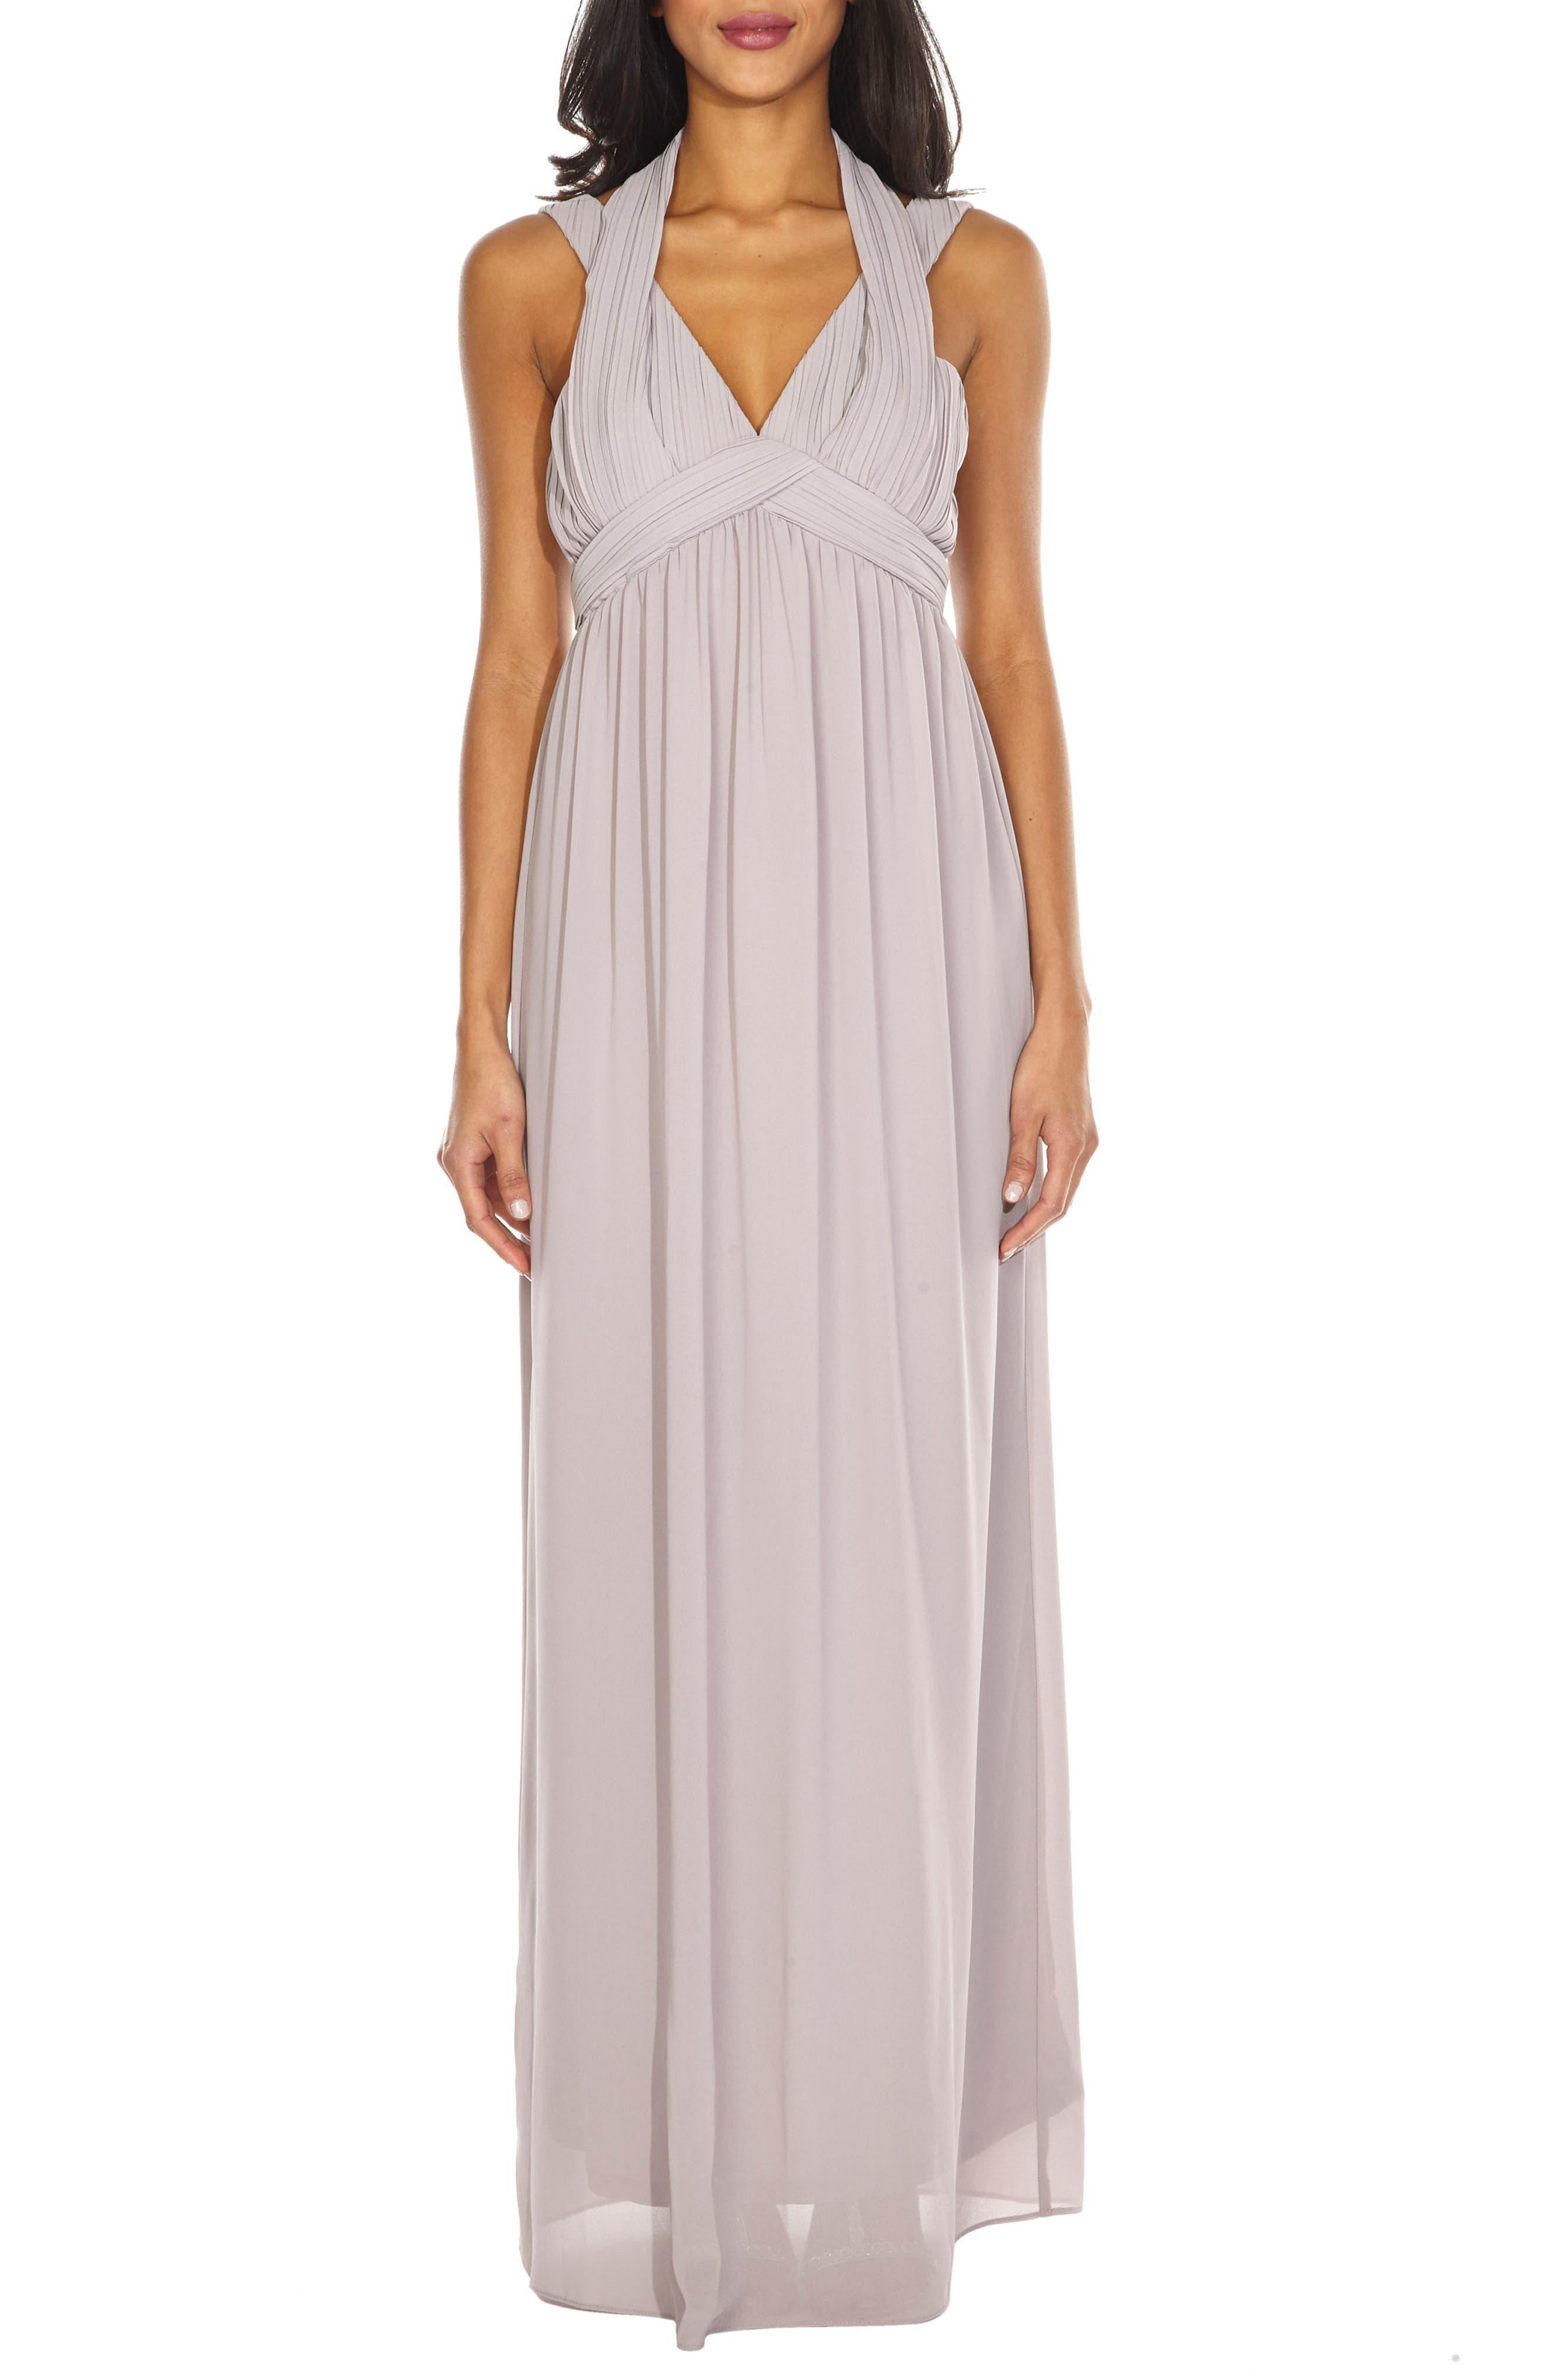 Arley Chiffon Gown,                             Main thumbnail 1, color,                             Lavender Fog